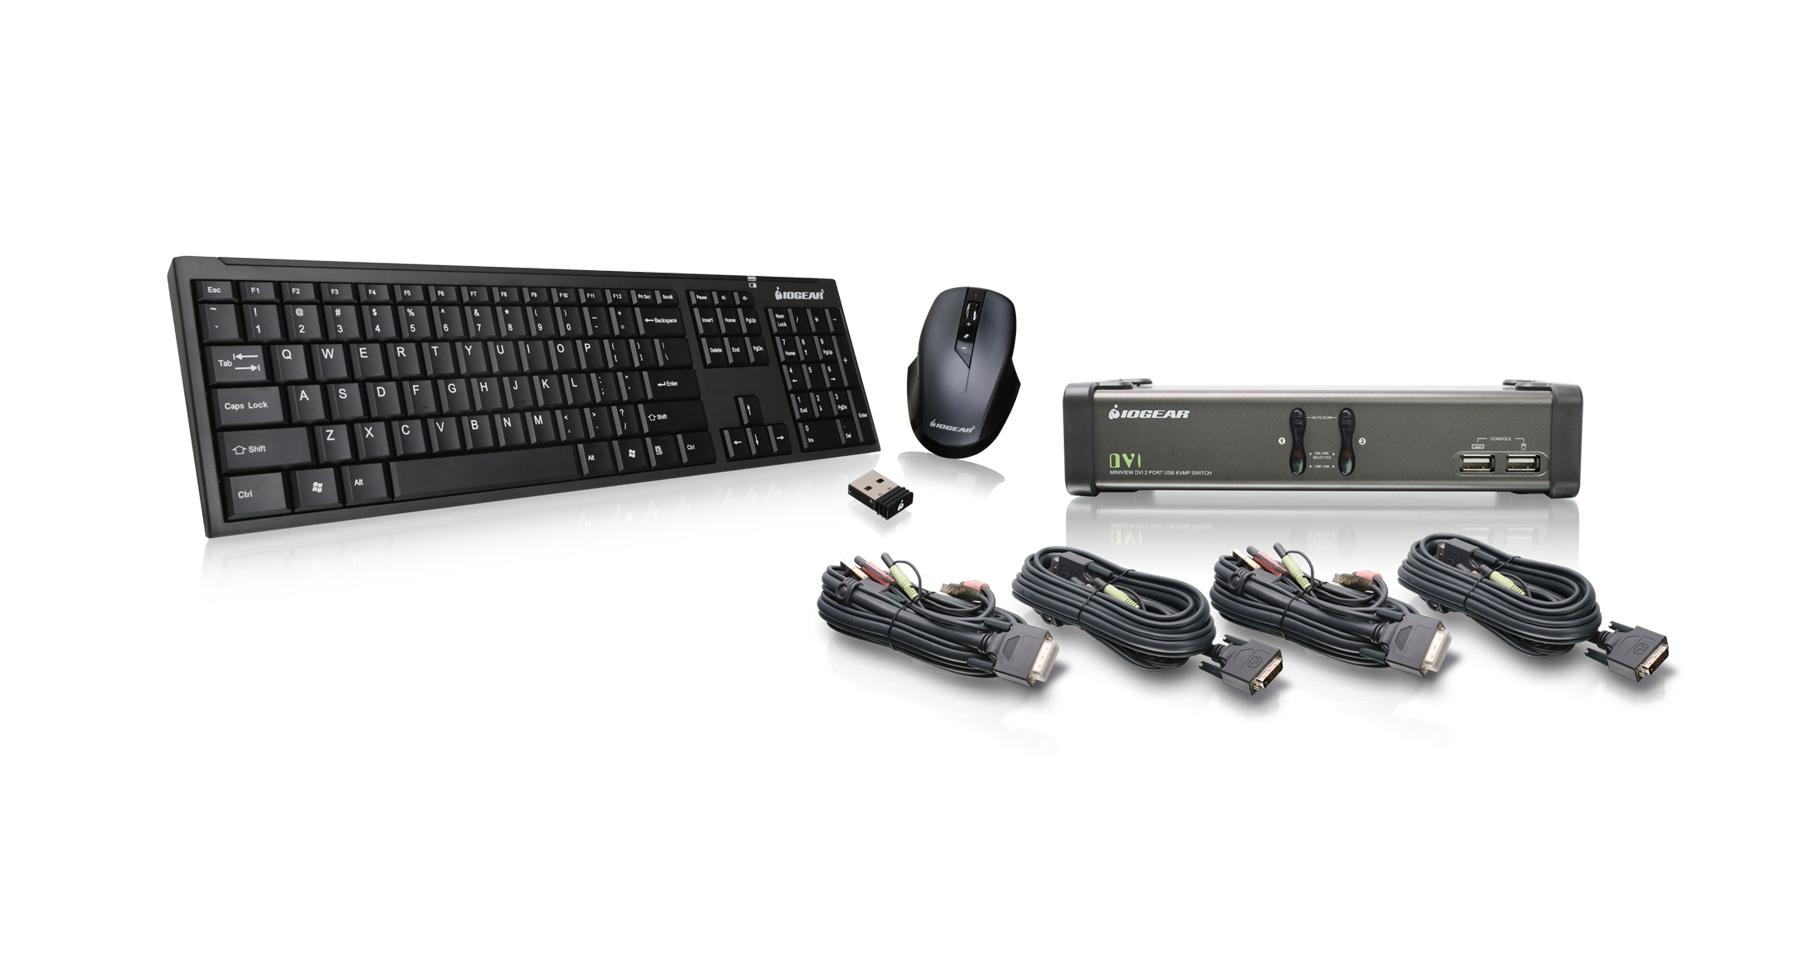 IOGEAR GCSKM Port DVI KVMP With Cables And Wireless - Port dvi